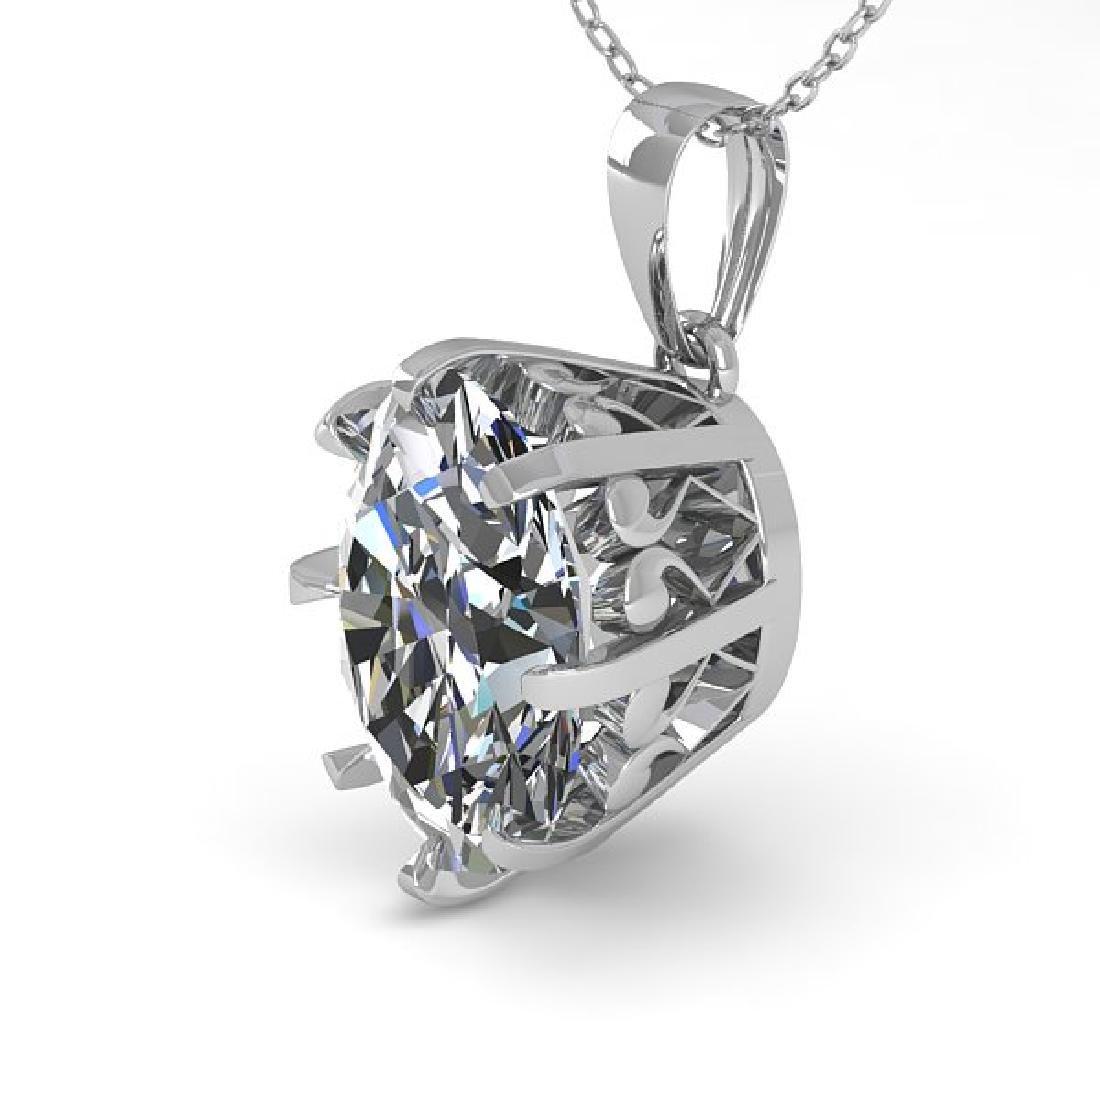 1 CTW VS/SI Oval Diamond Solitaire Necklace 14K White